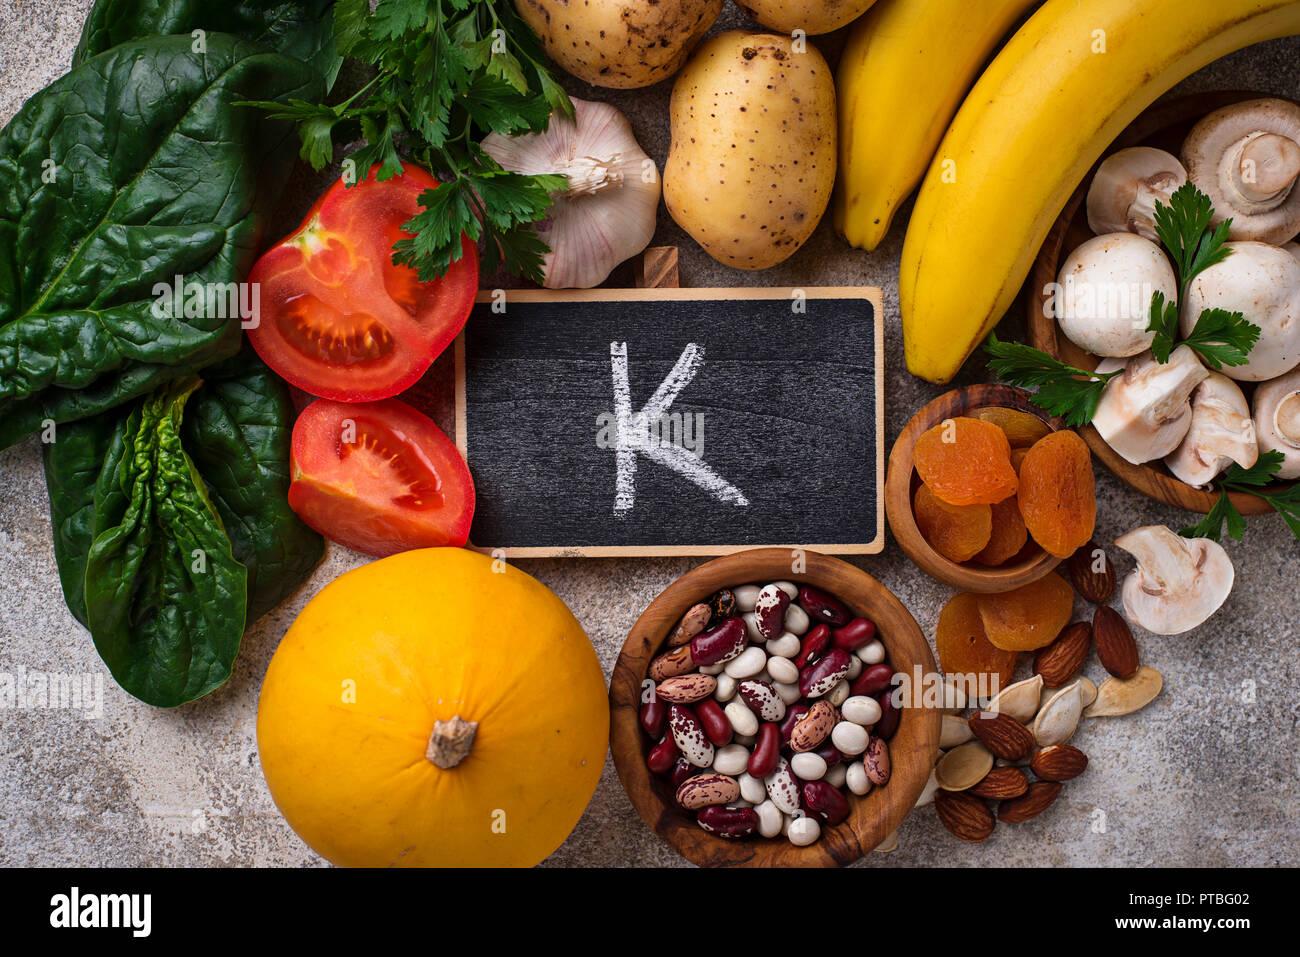 Products containing potassium